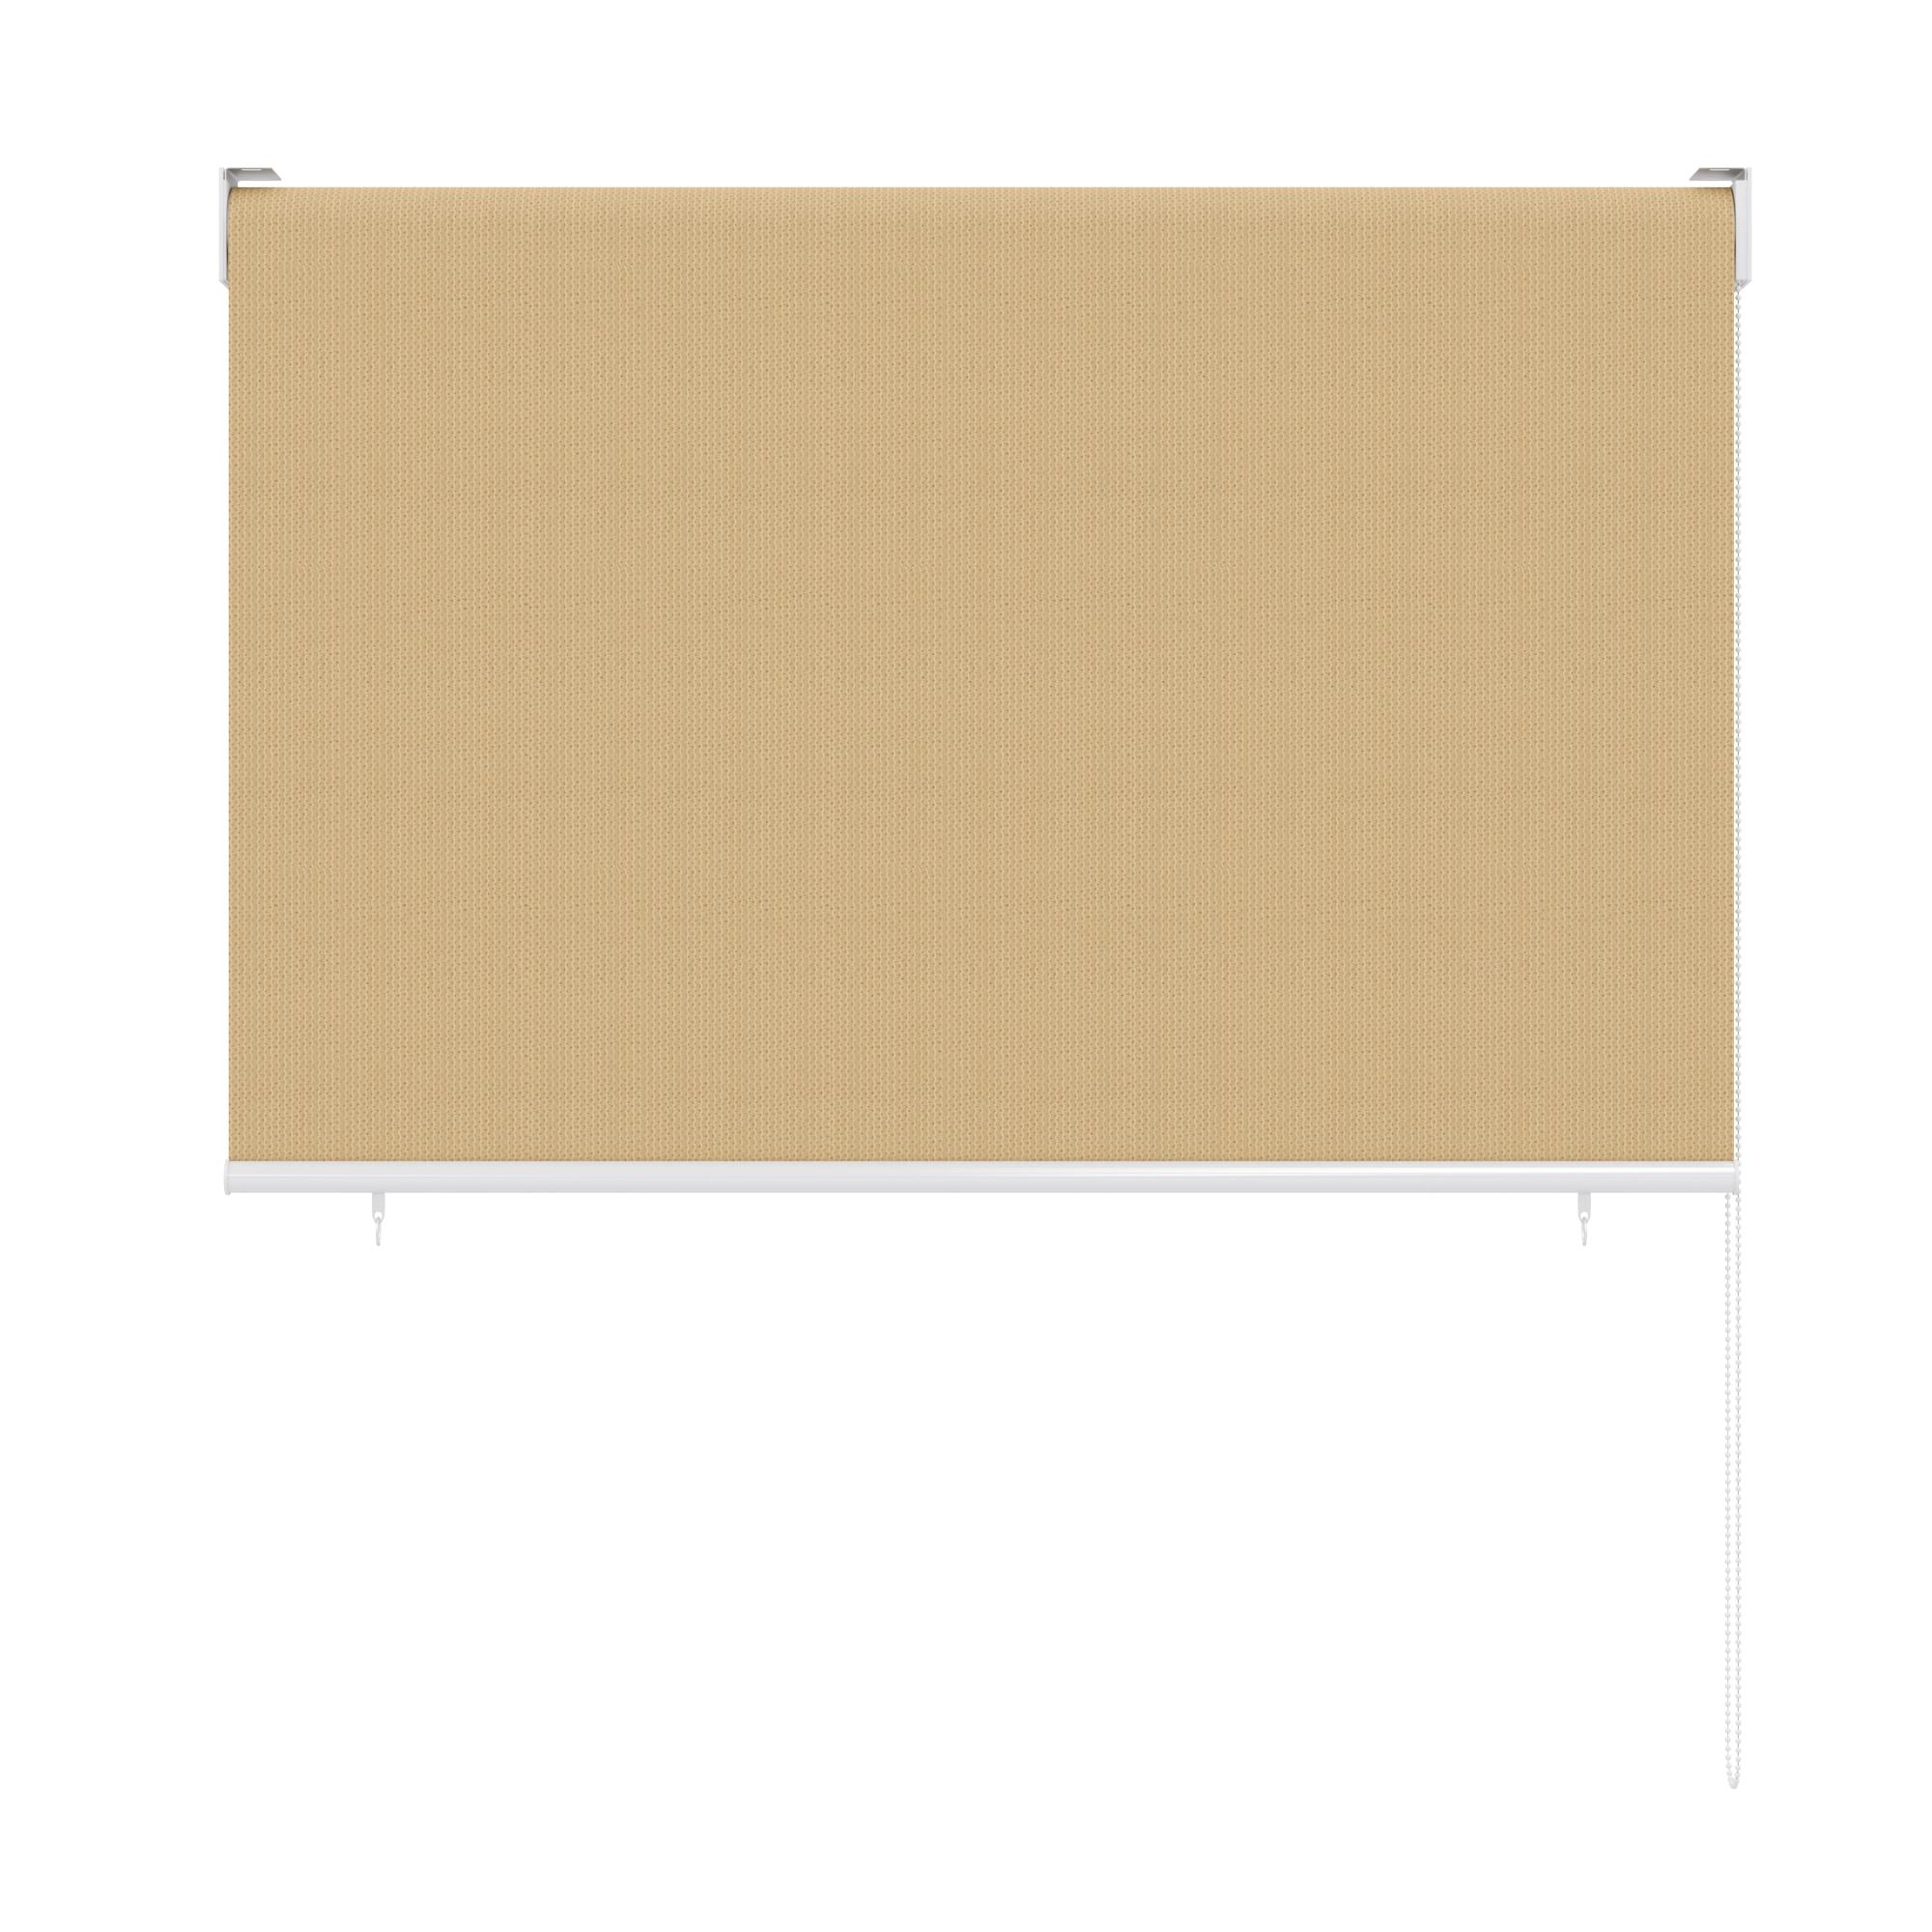 JAROLIFT-Senkrechtmarkise-Sichtschutz-Aussenrollo-Sonnenschutz-Aussen-Rollo-Balkon Indexbild 4